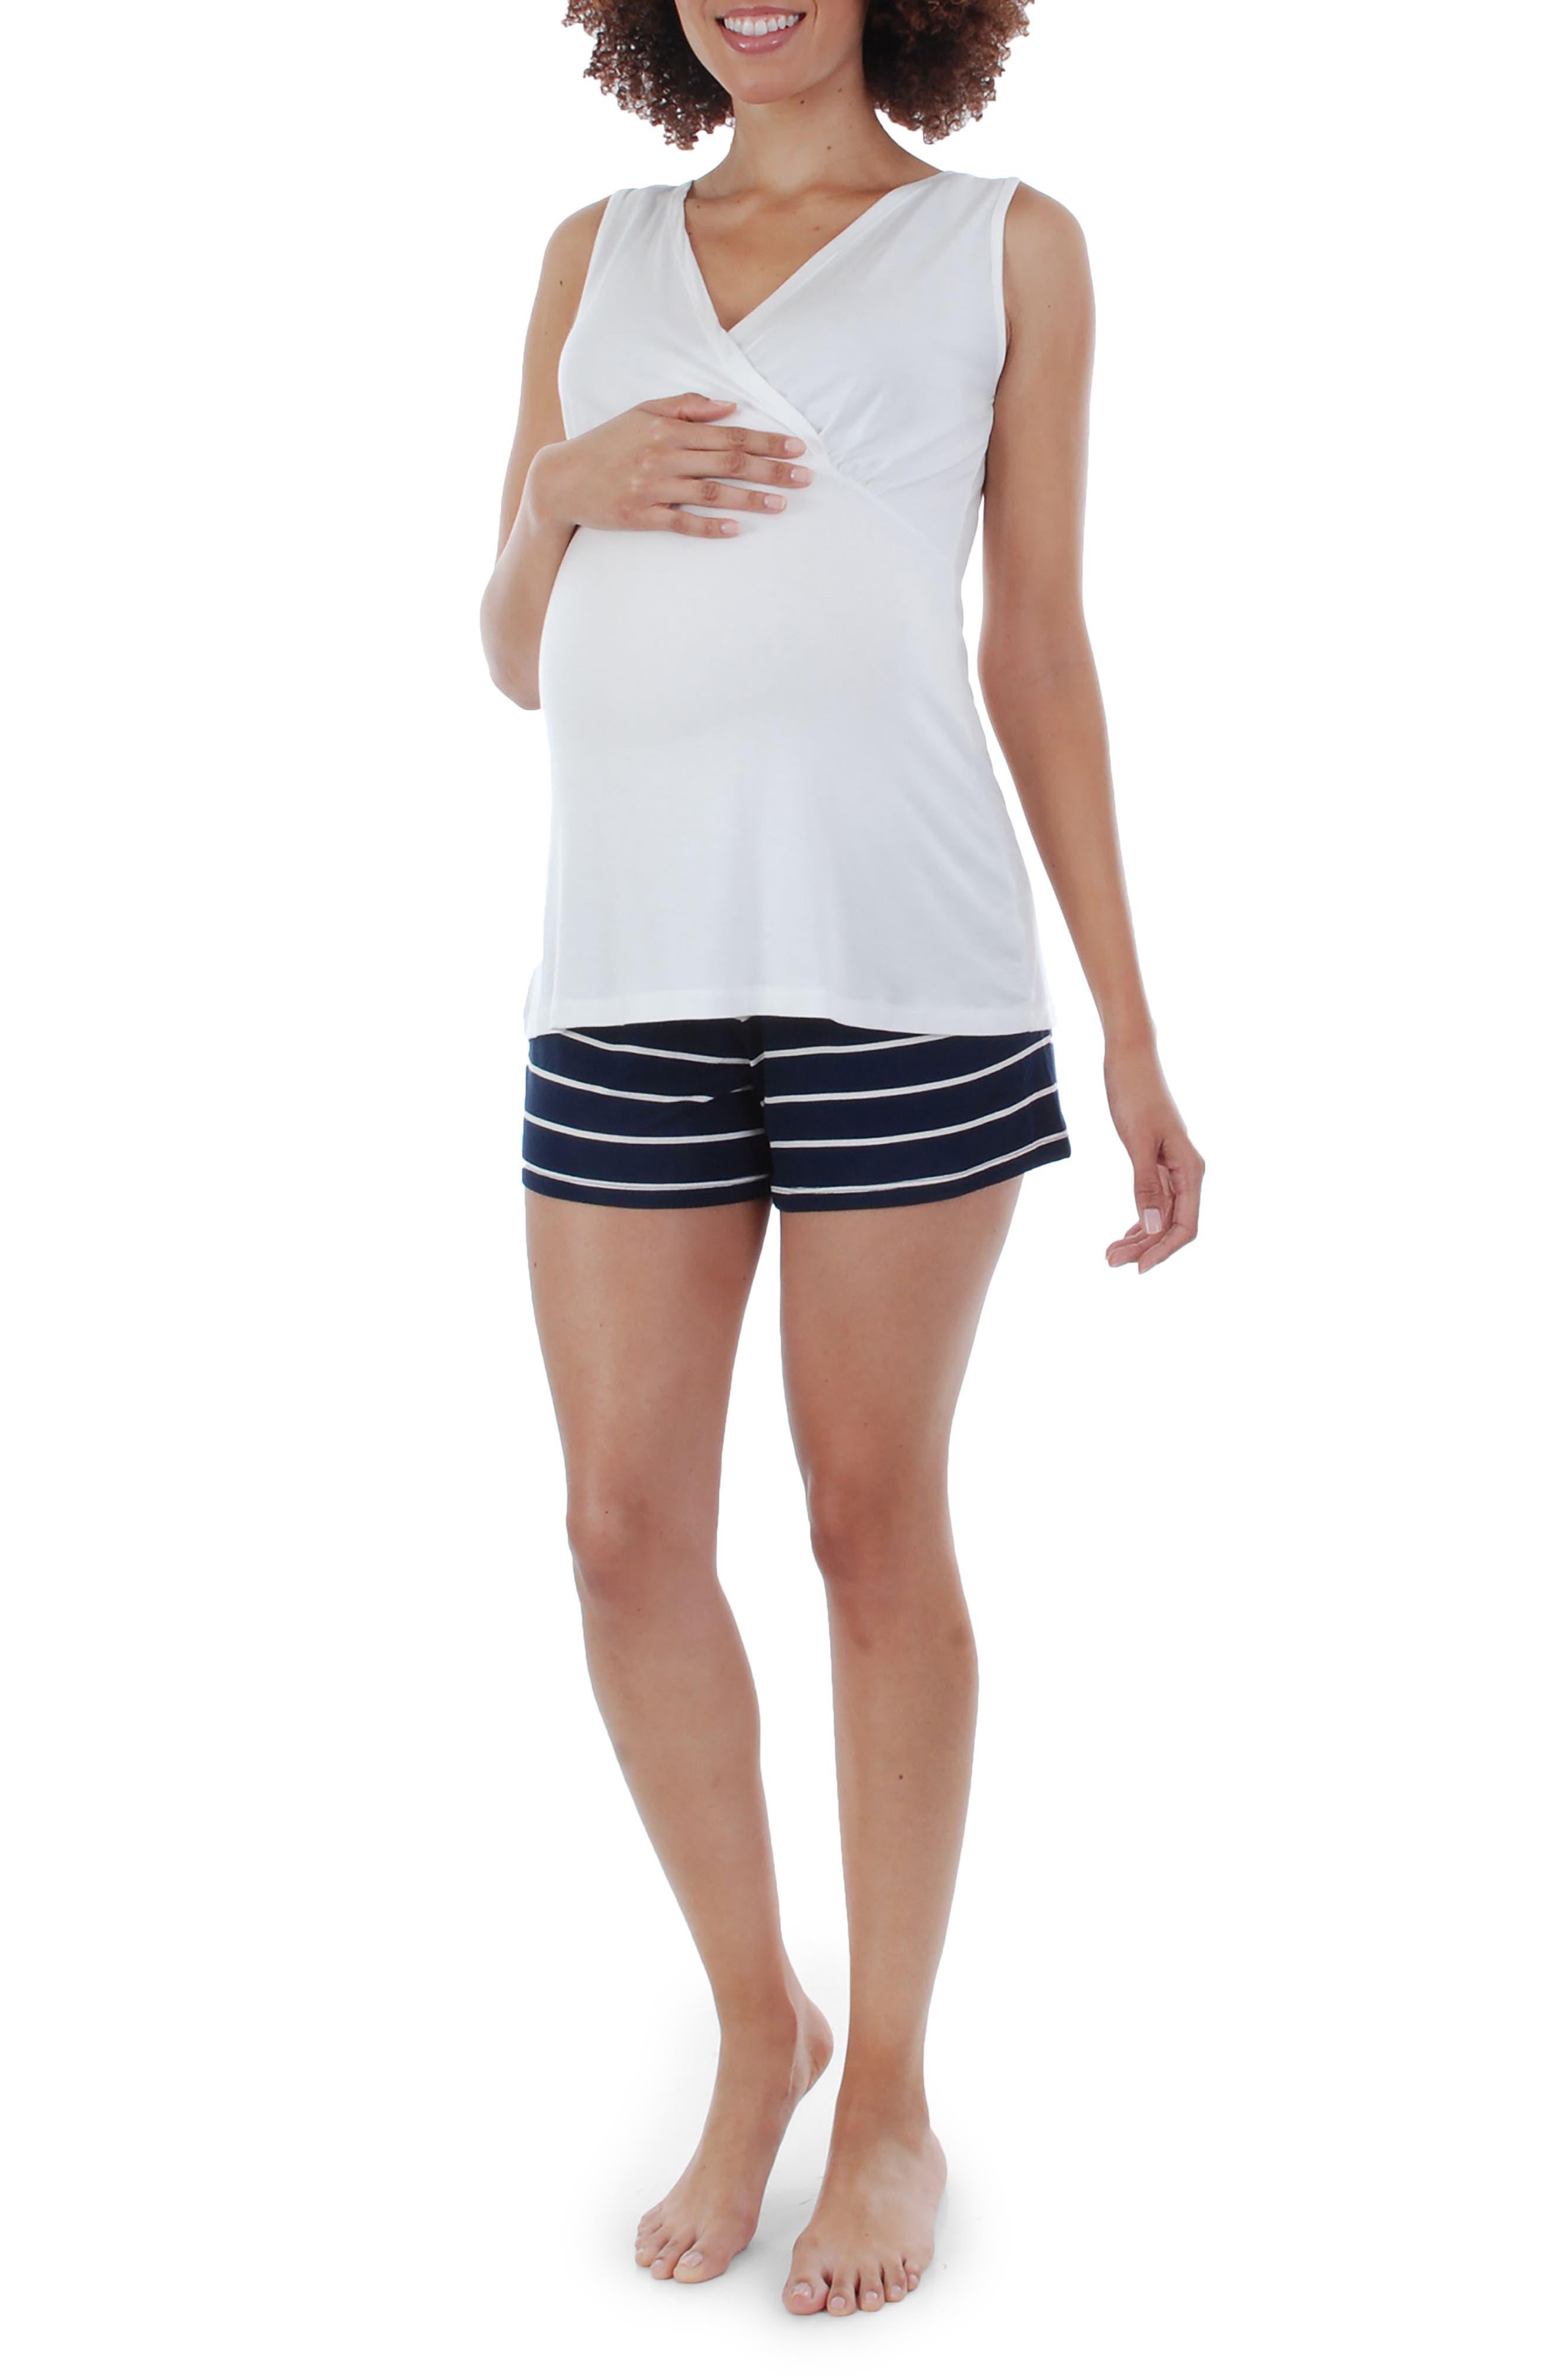 EVERLY GREY,                             Adalia 5-Piece Maternity/Nursing Pajama Set,                             Alternate thumbnail 3, color,                             NAVY STRIPE